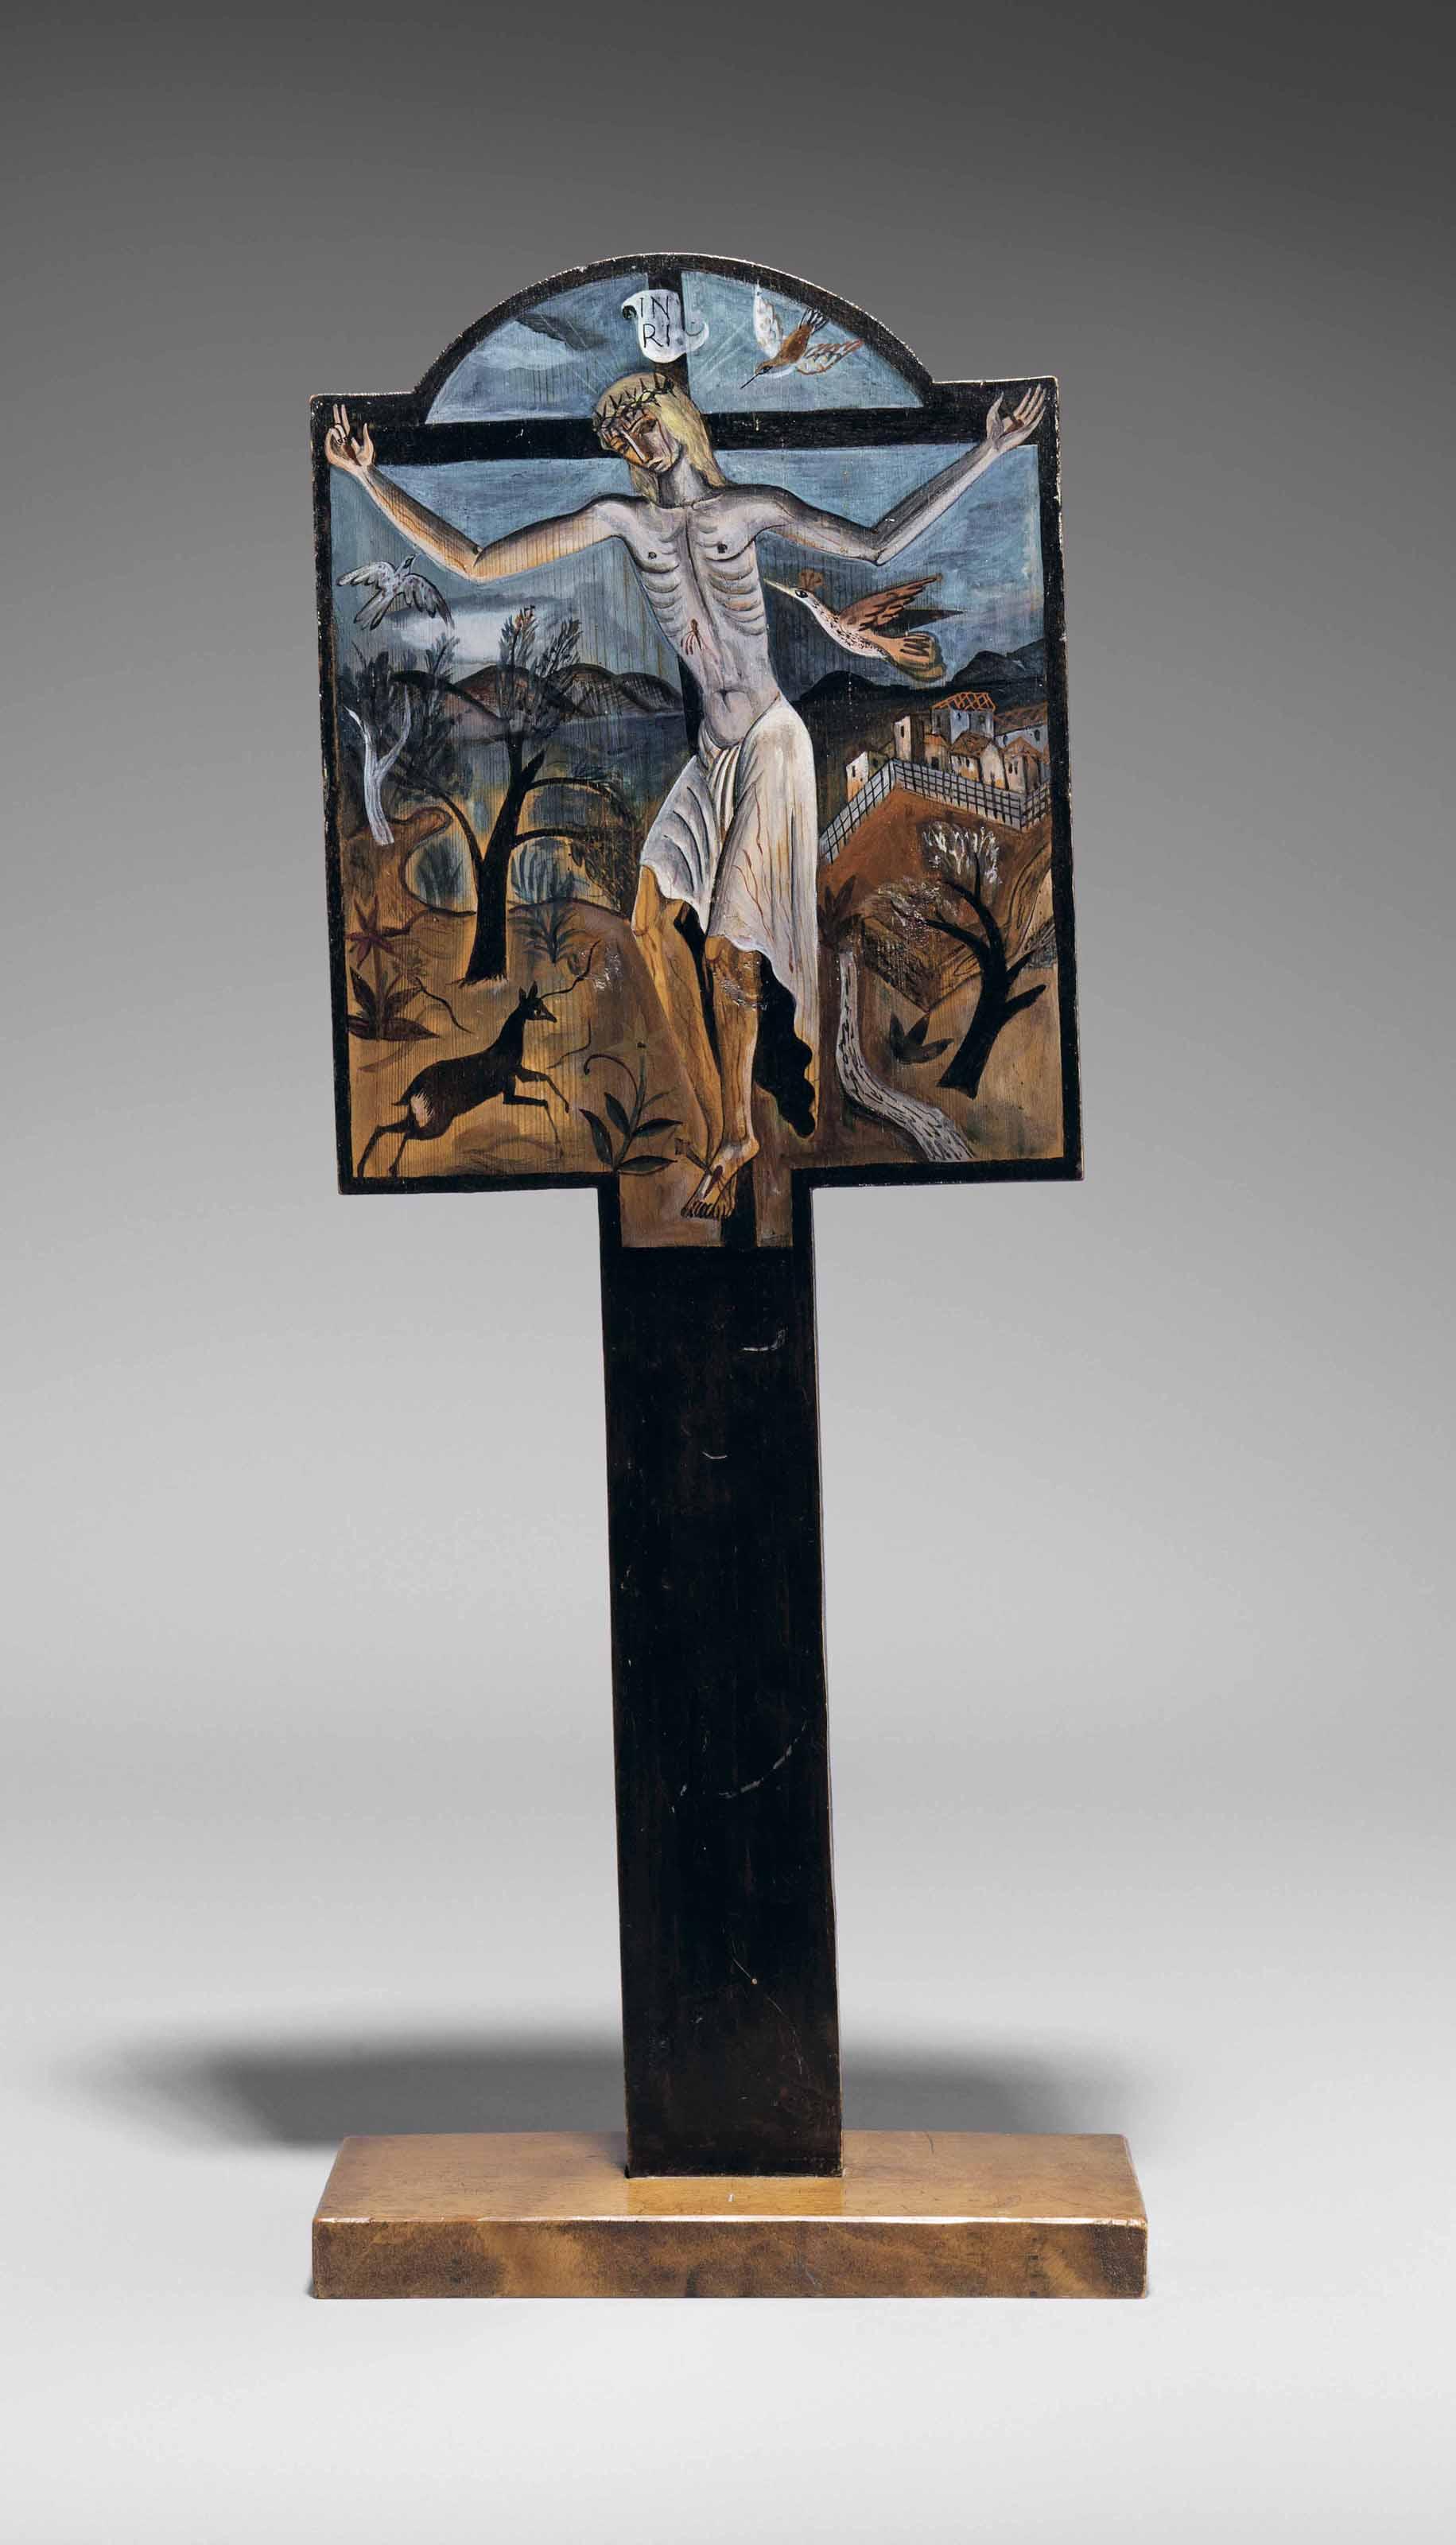 David jones ch 1895 1974 crucifix for the chapel at david jones ch 1895 1974 buycottarizona Image collections